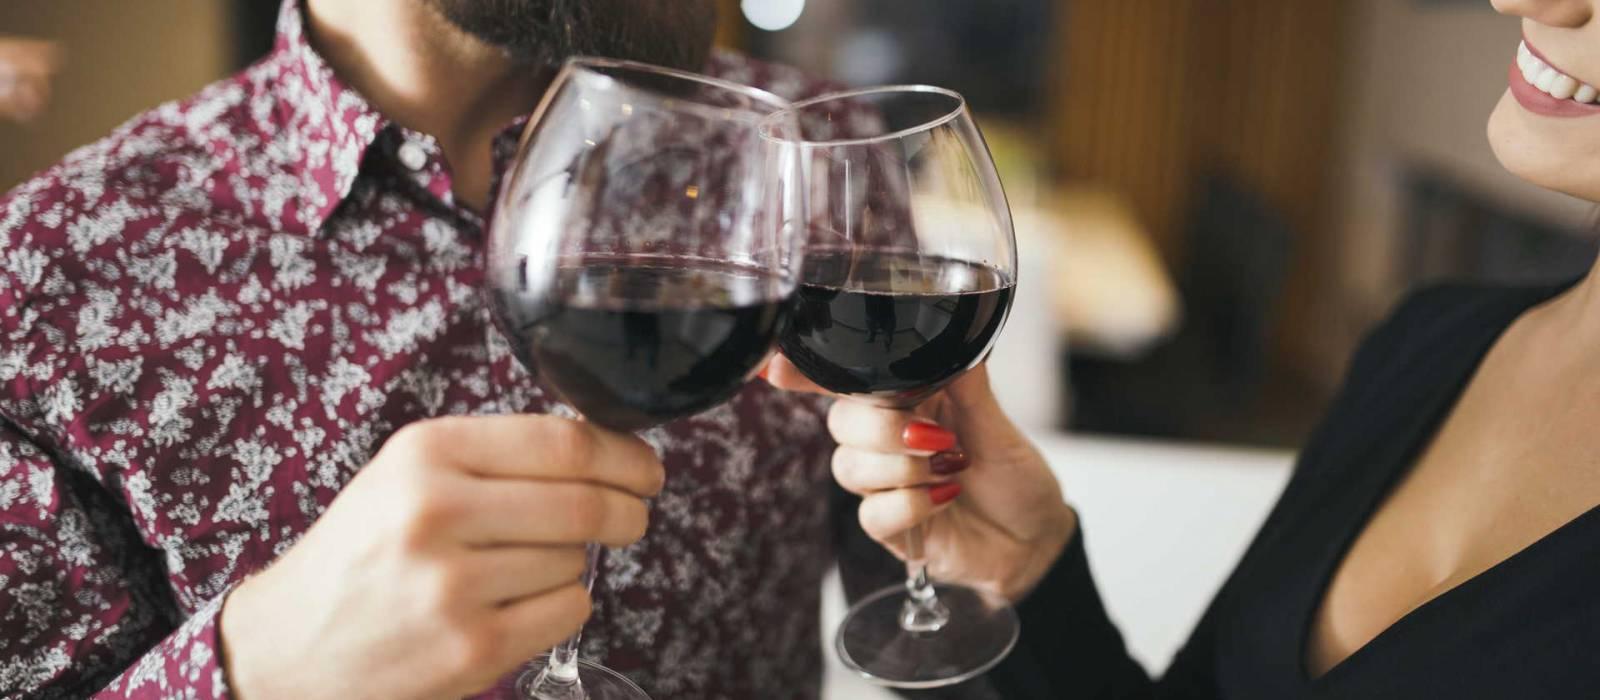 Vincci La Rábida | Sevilla | La Rábida Wine bar